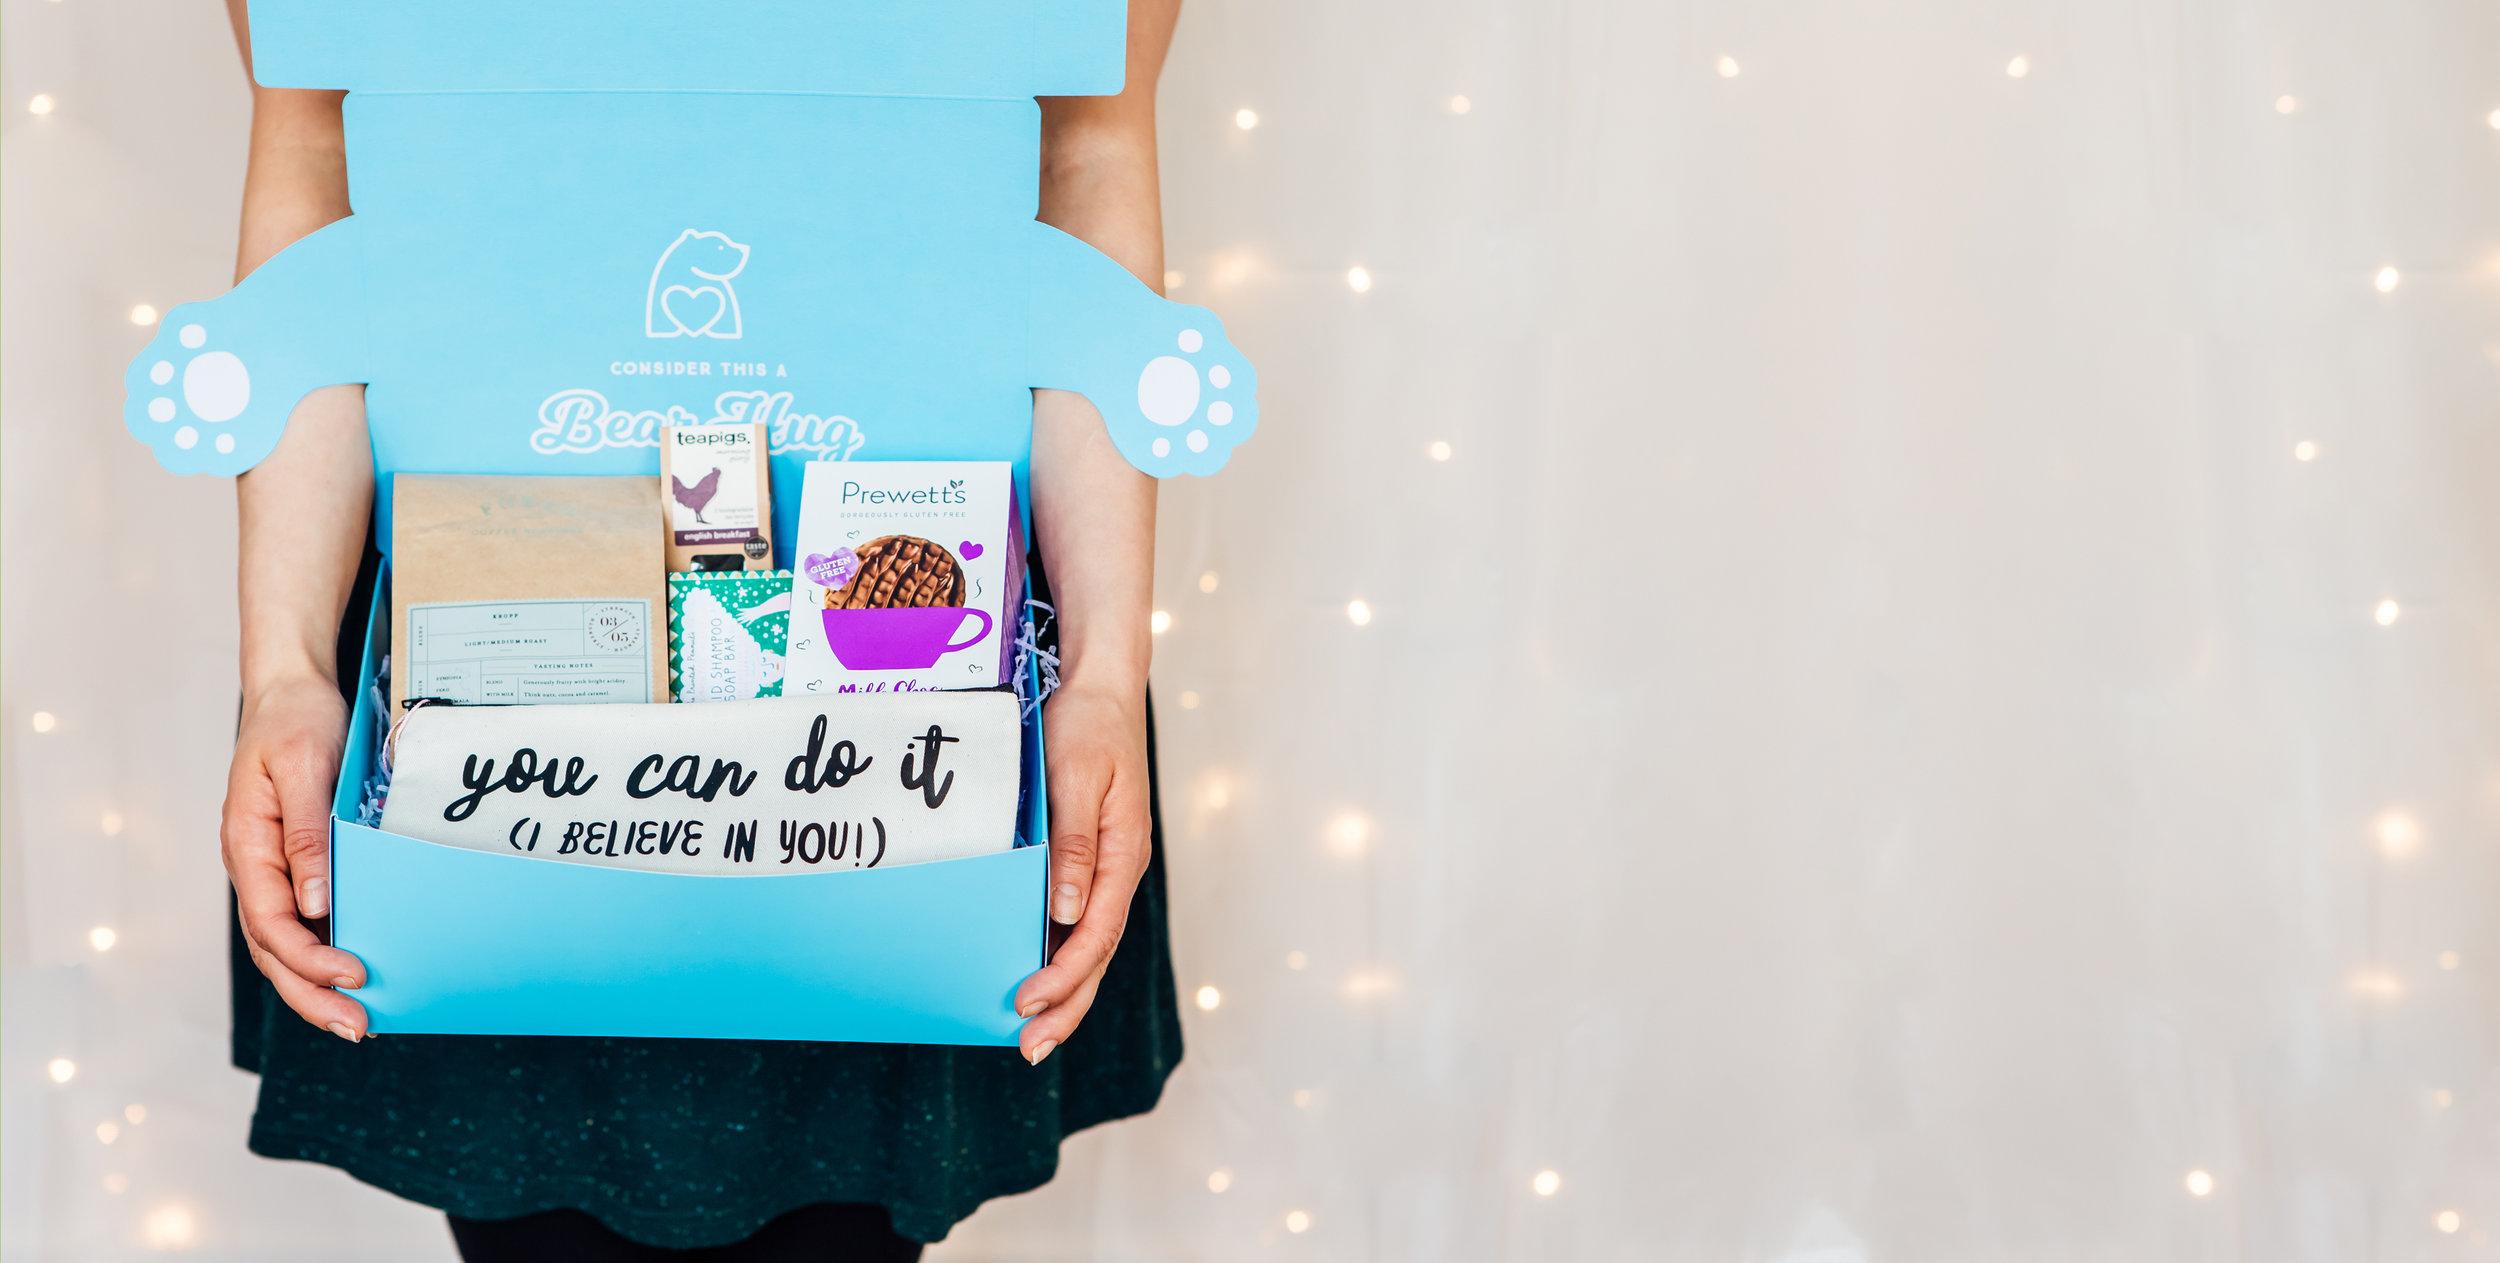 cheer up gift ideas bearhugs bear hug in a box care package